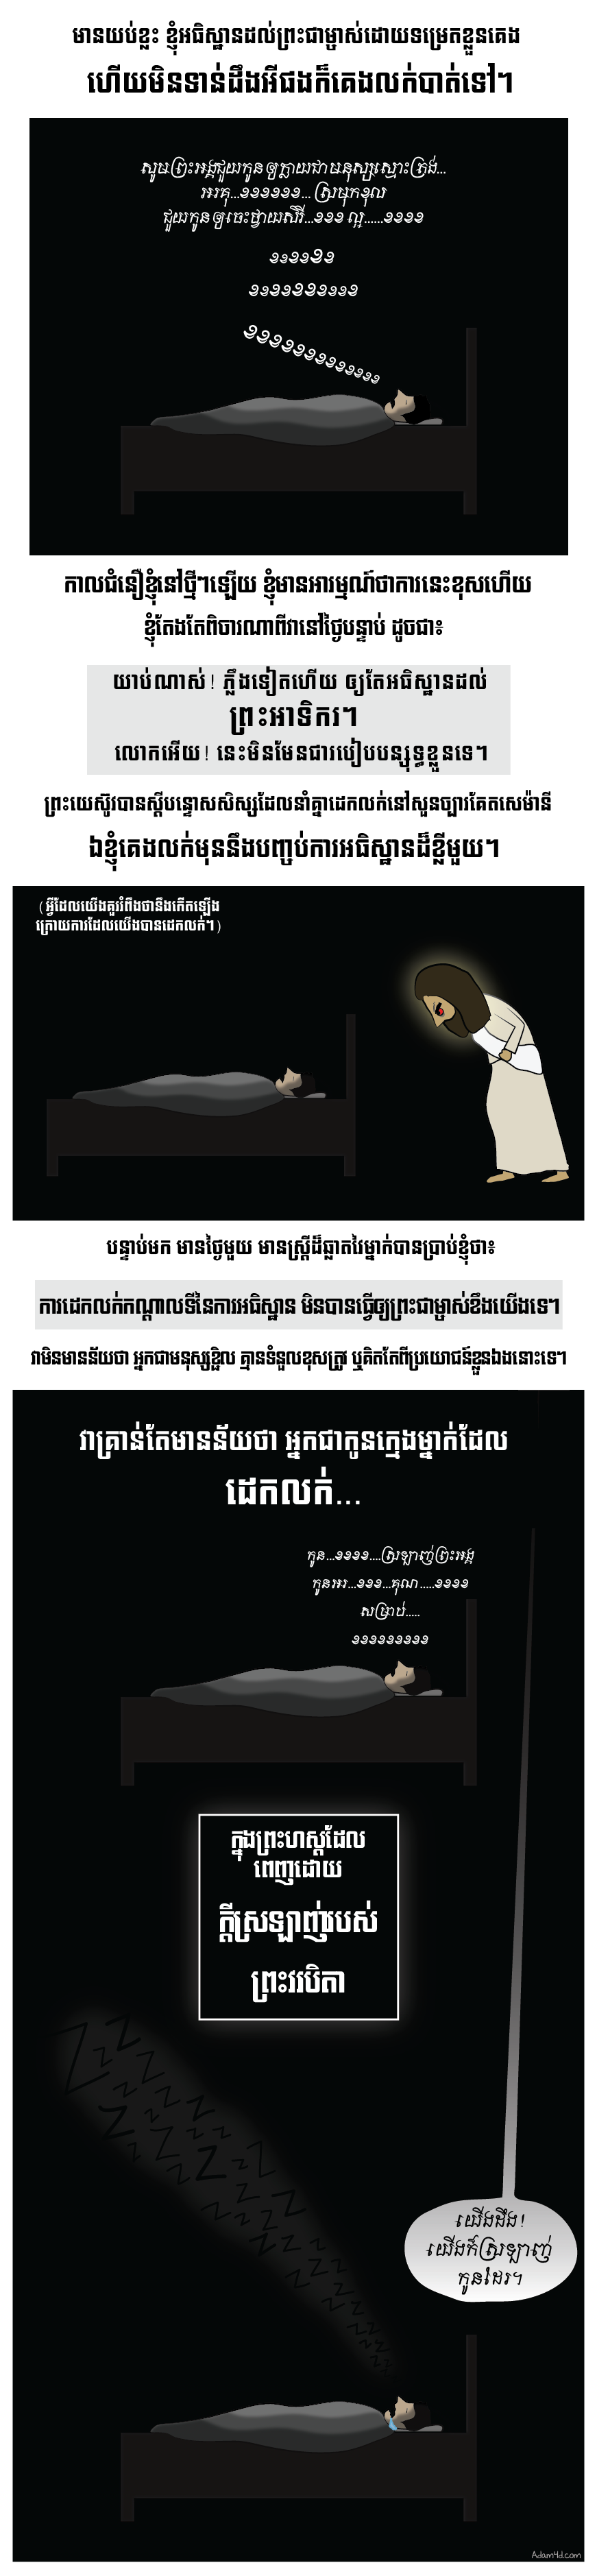 Asleep while praying to God.Khmer New